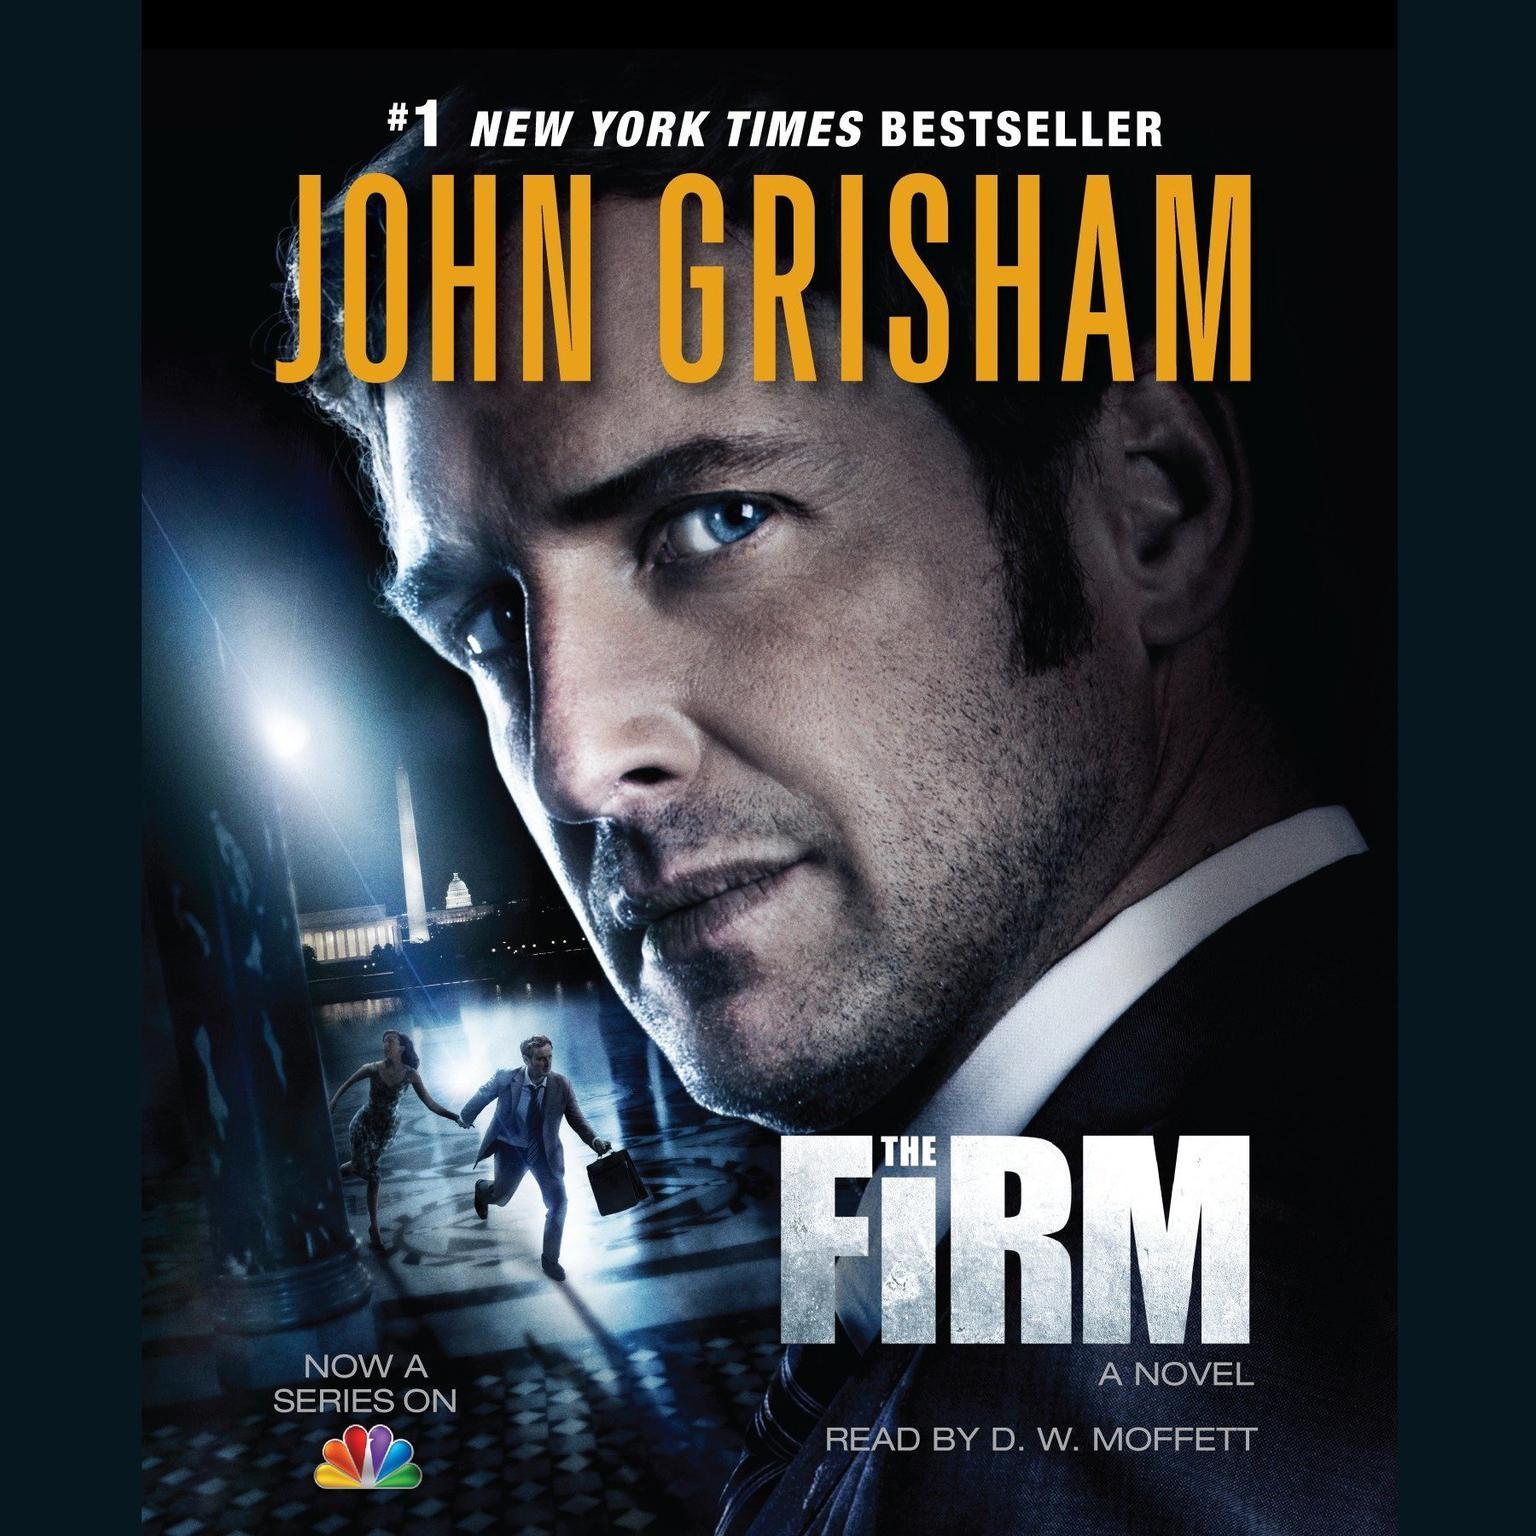 The Firm (Abridged): A Novel Audiobook, by John Grisham